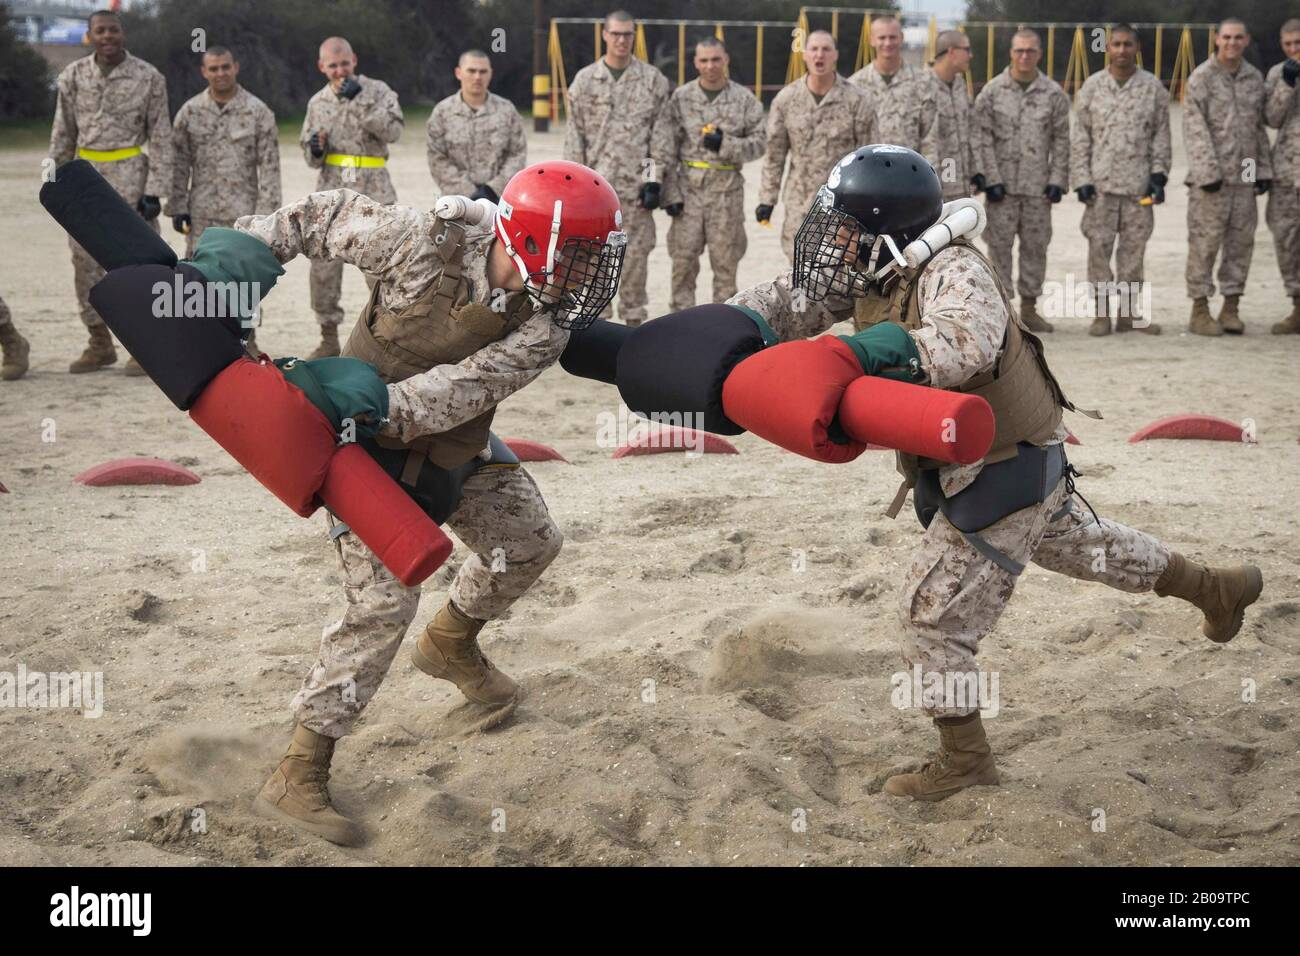 U.S. Marine Corps recruits with Delta Company, 1st Recruit Training Battalion, participate in Pugil Sticks training at Marine Corps Recruit Depot February 18, 2020 in San Diego, California. Stock Photo